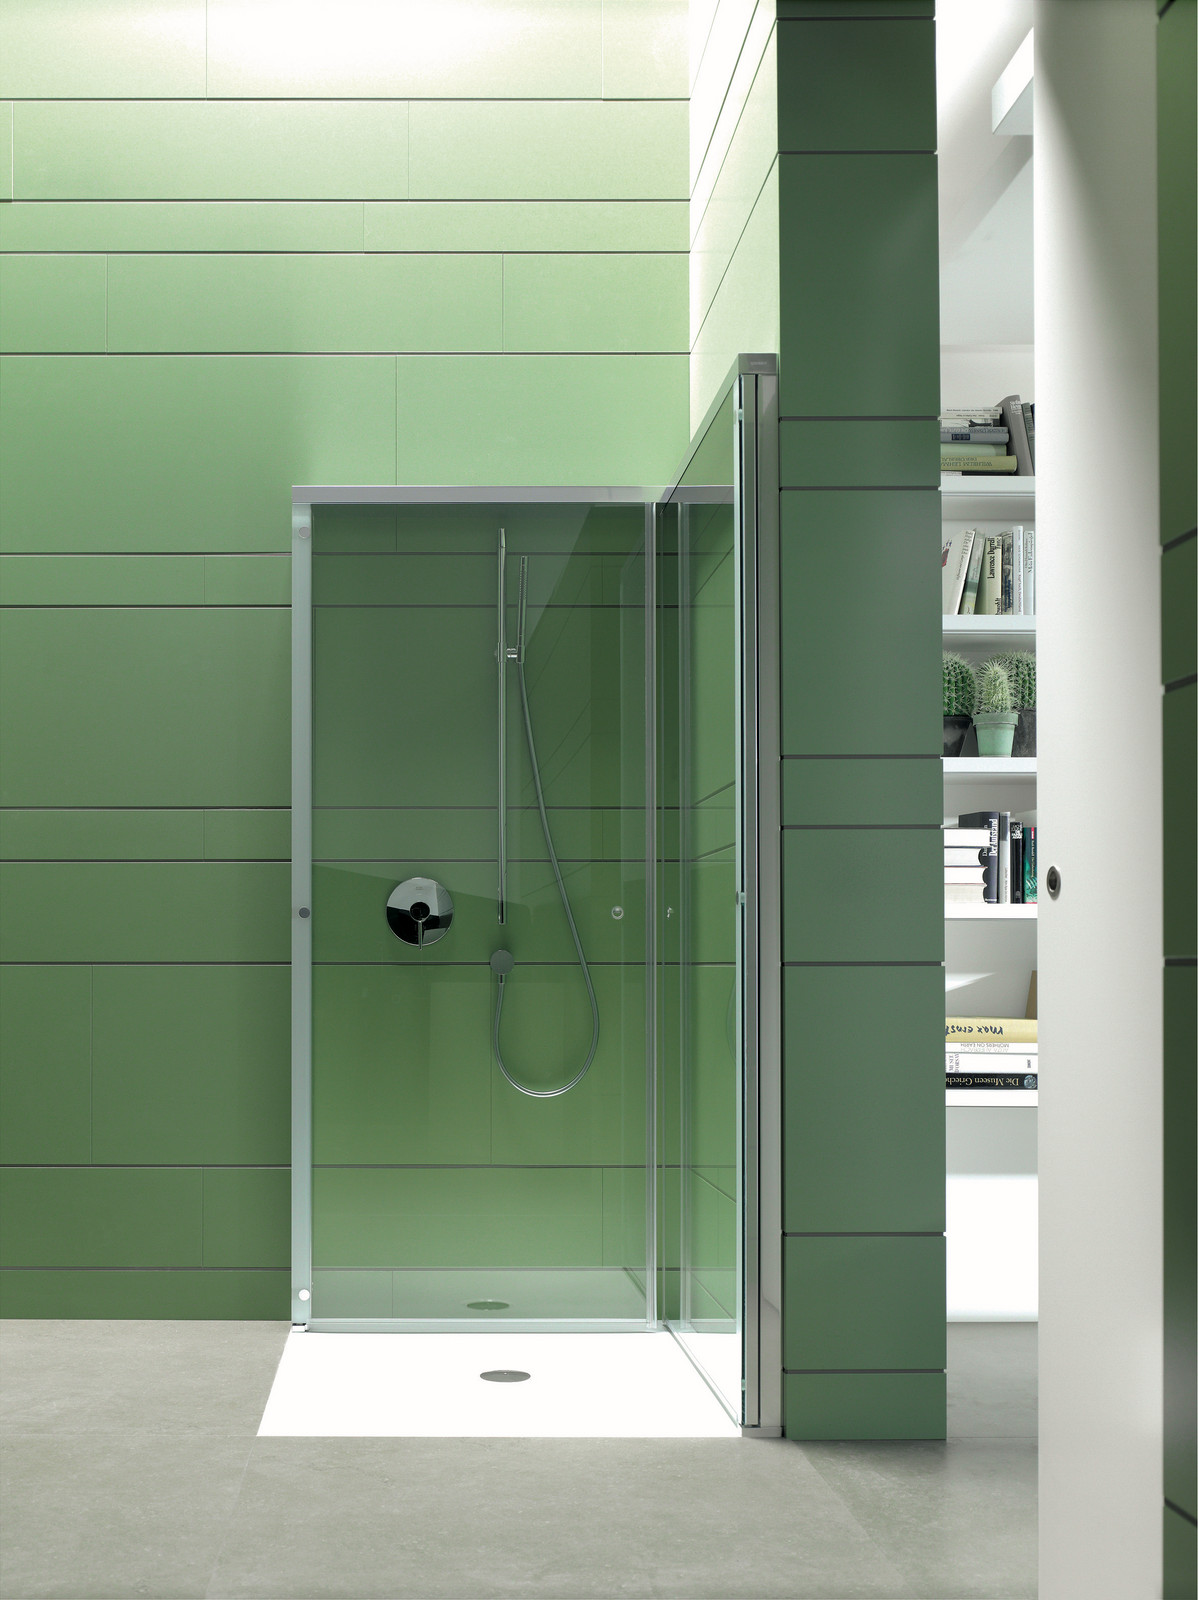 Openspace vf confort salle de bains chauffage for H s bains sons